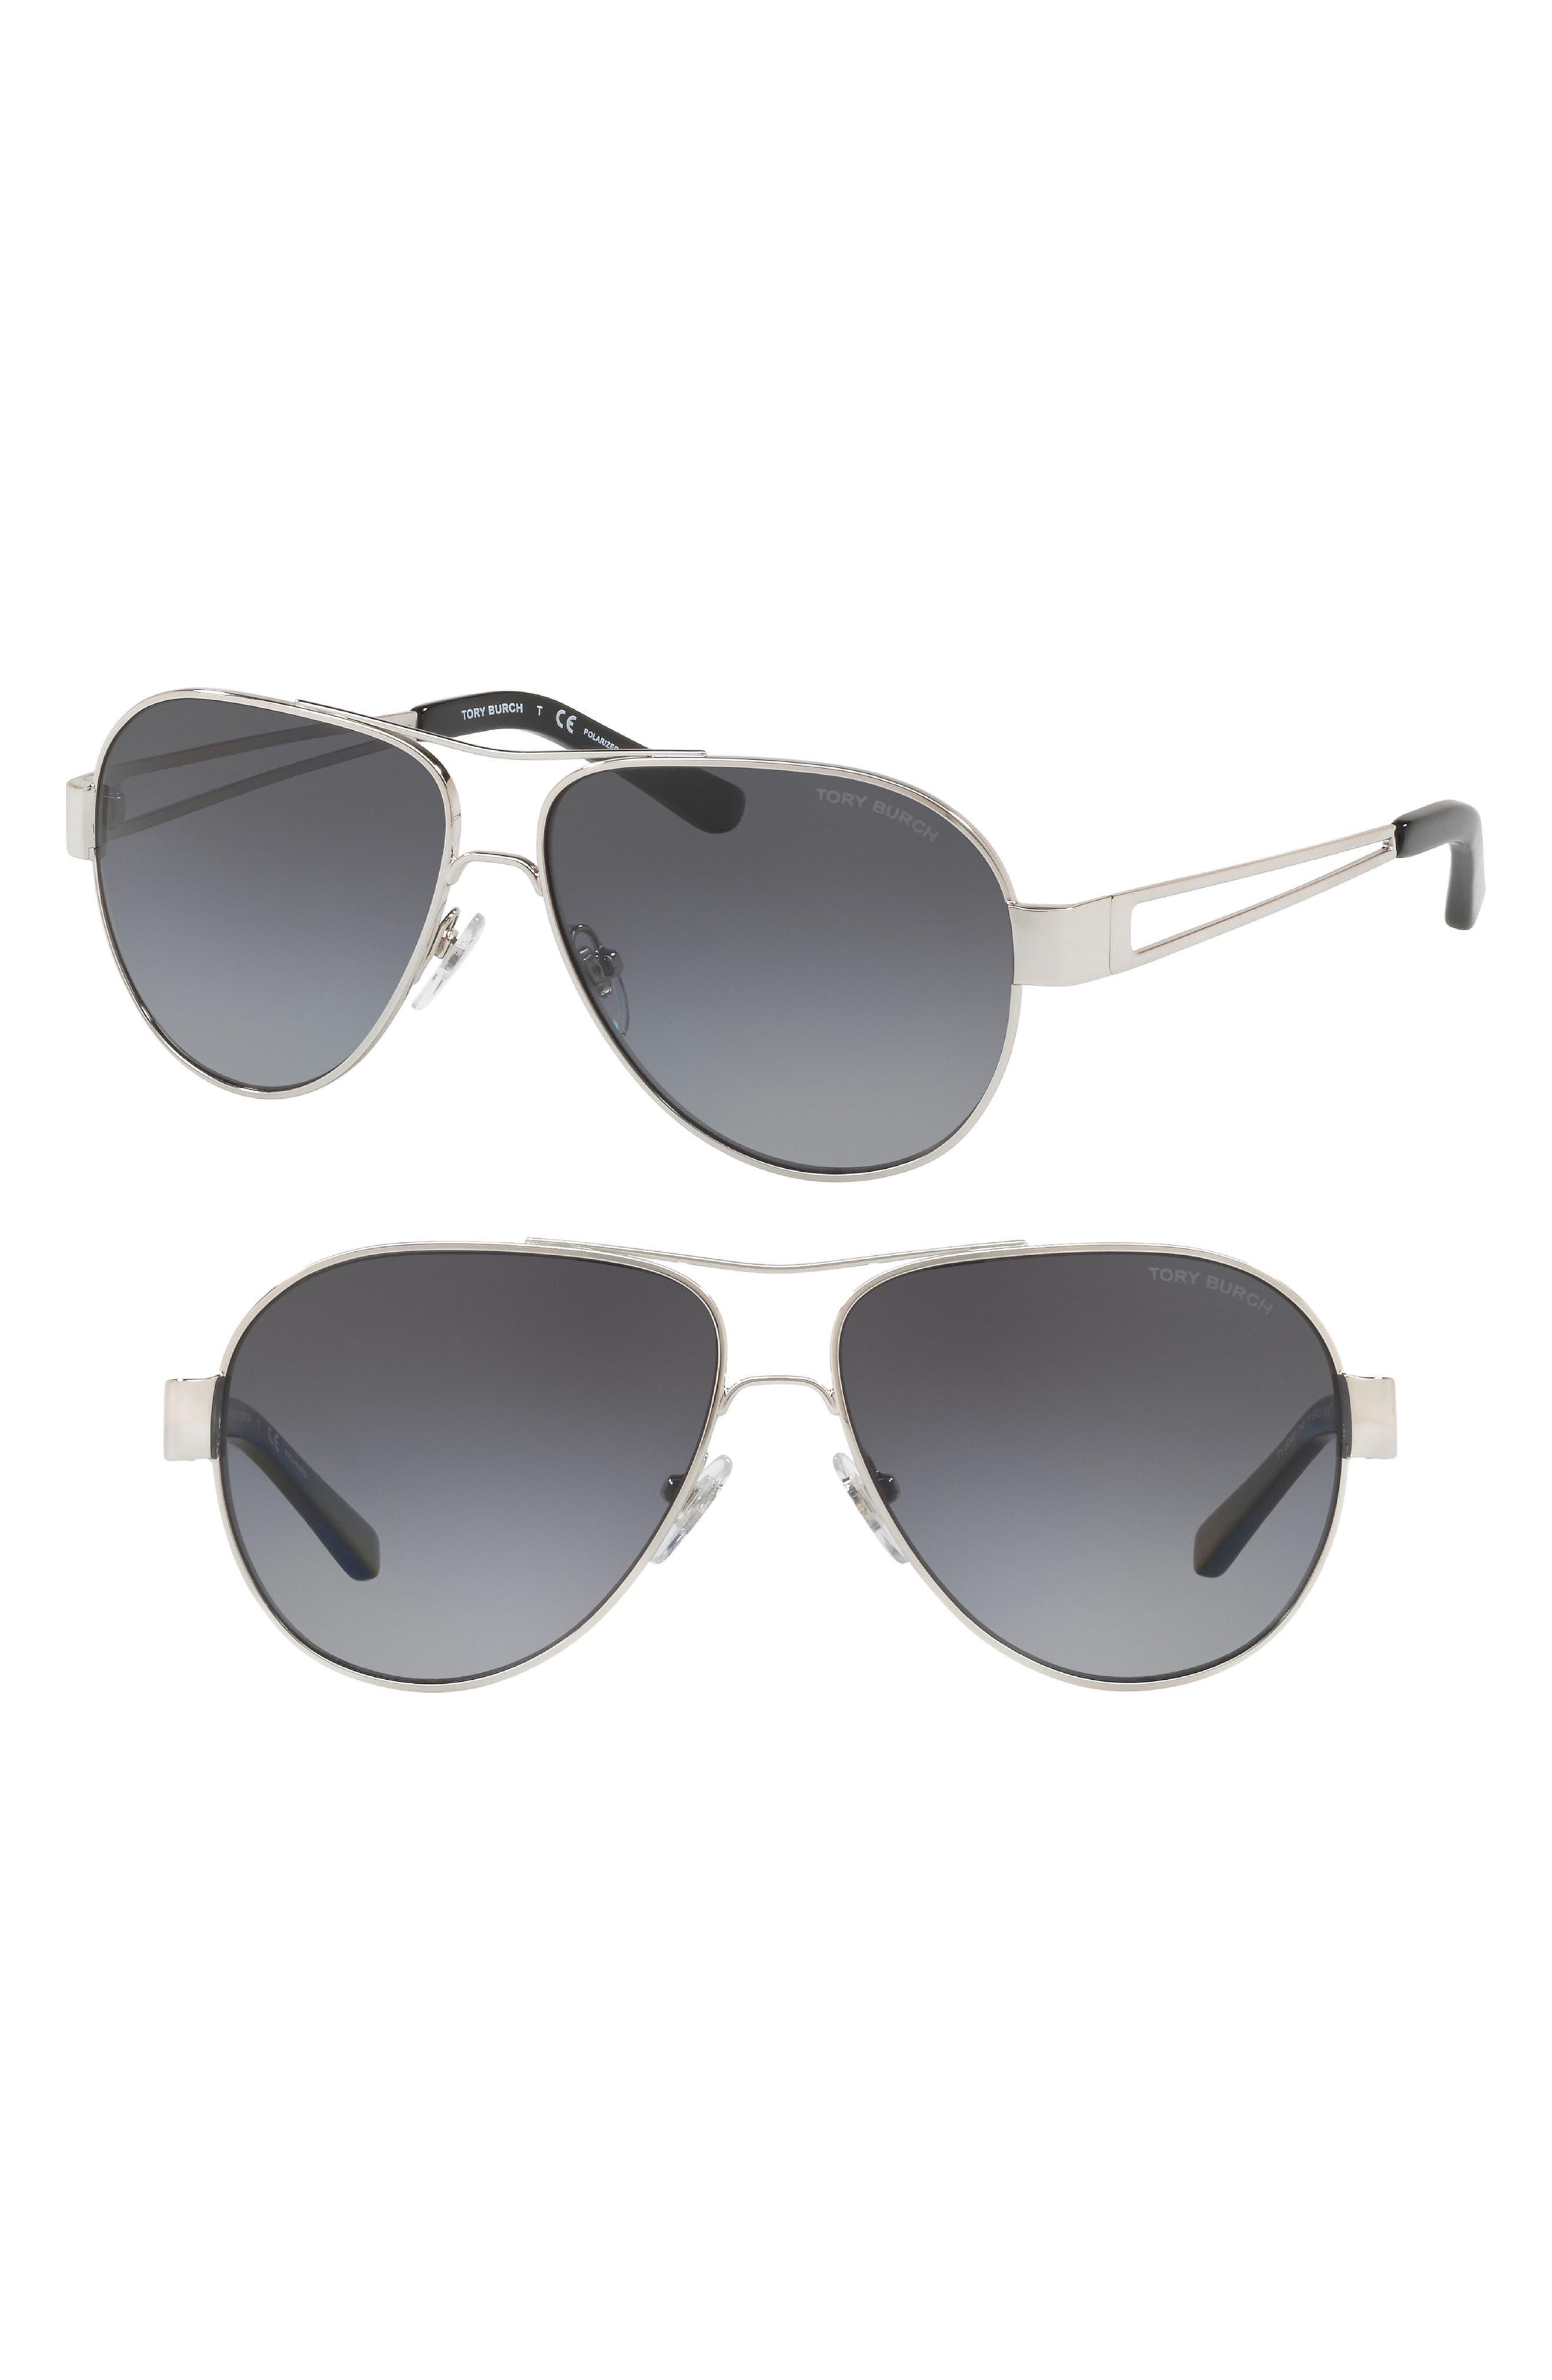 TORY BURCH,                             55mm Polarized Aviator Sunglasses,                             Main thumbnail 1, color,                             042